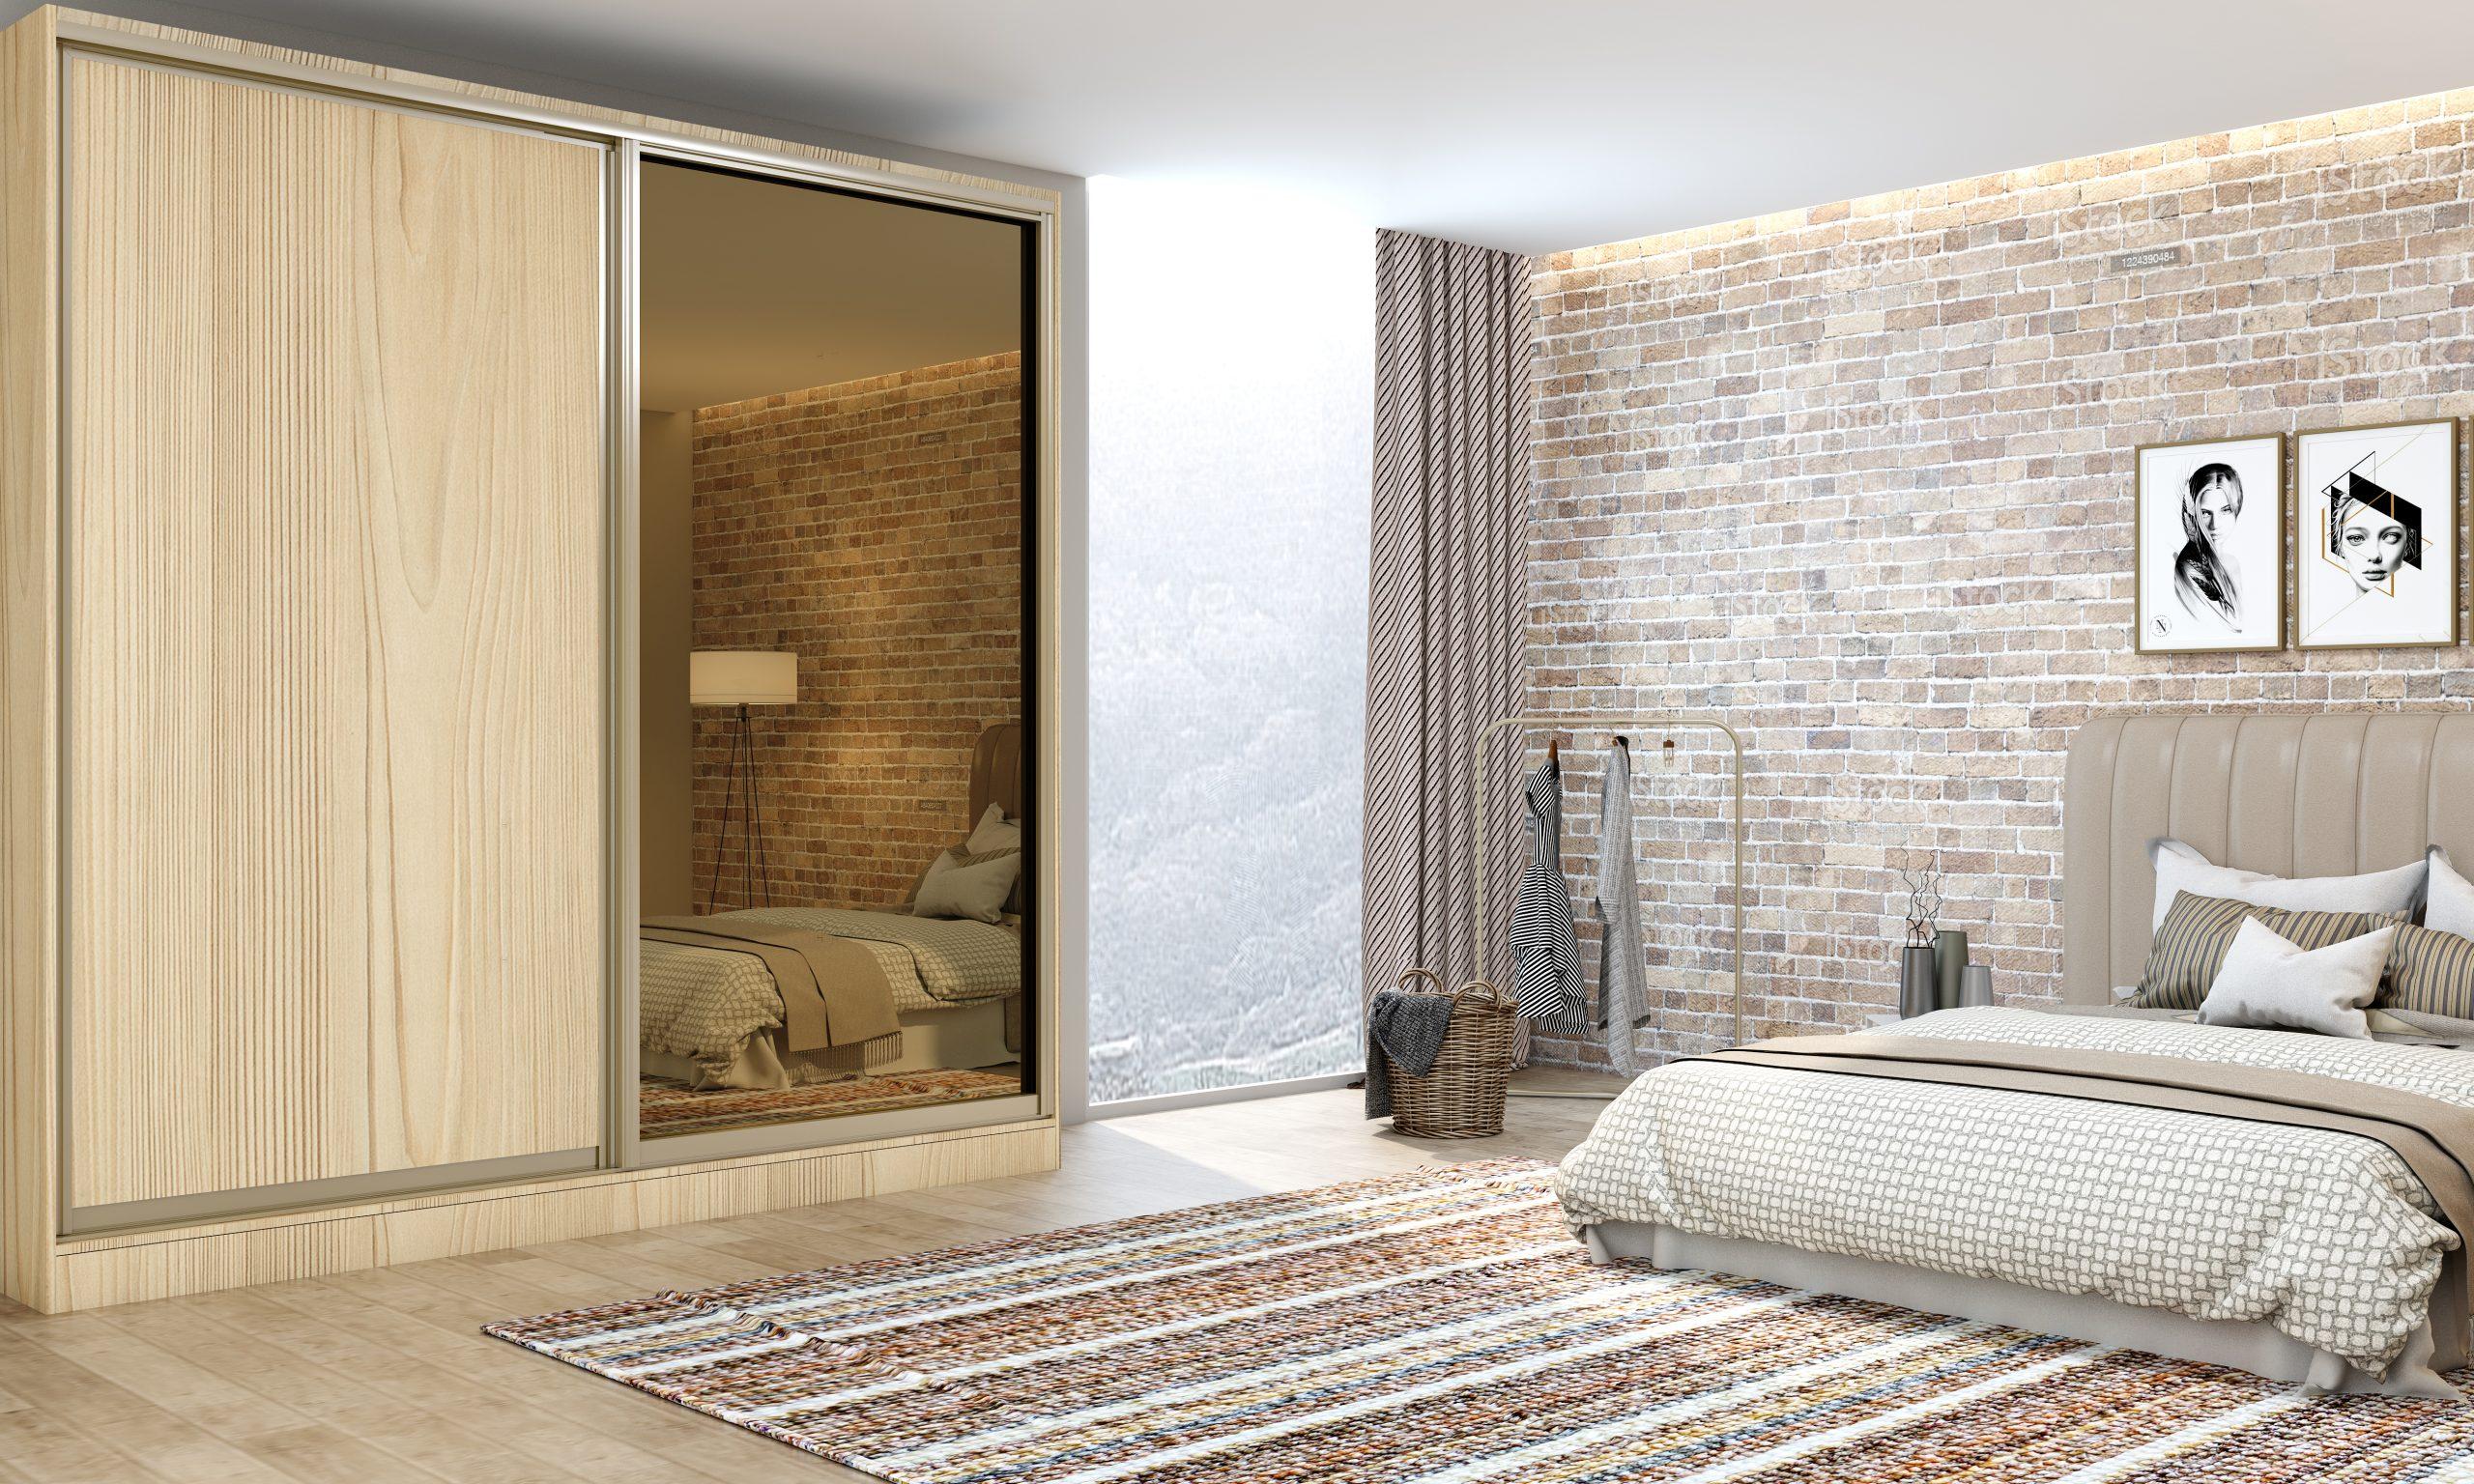 Bespoke Fitted Bedroom wooden sliding wardrobe in Woodgrain finish with full Bronze Mirror